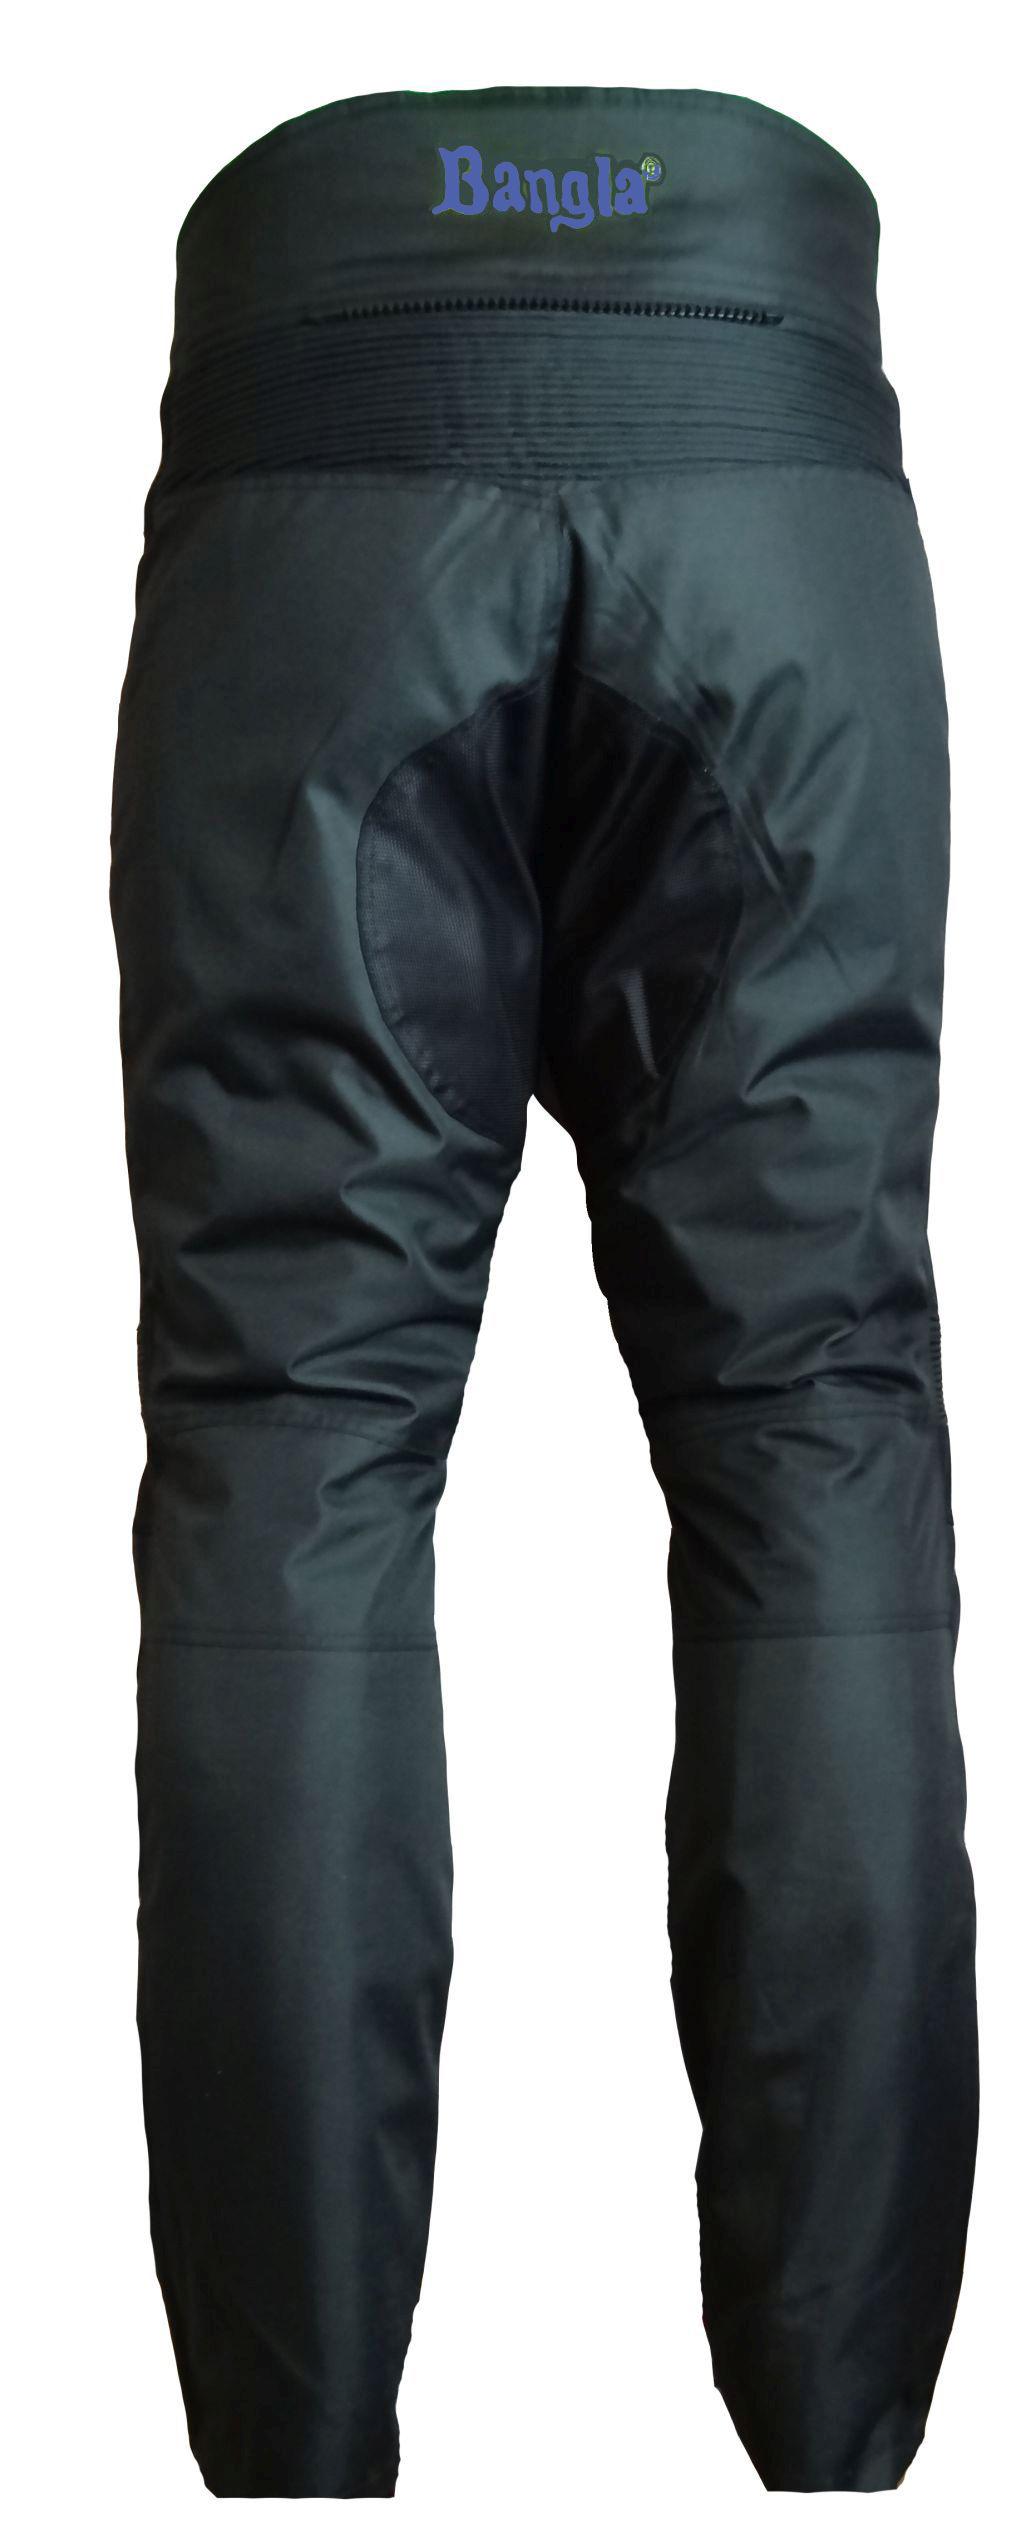 Bangla Motorrad Hose Motorradhose Protektoren Textil Cordura schwarz blau S-8 XL